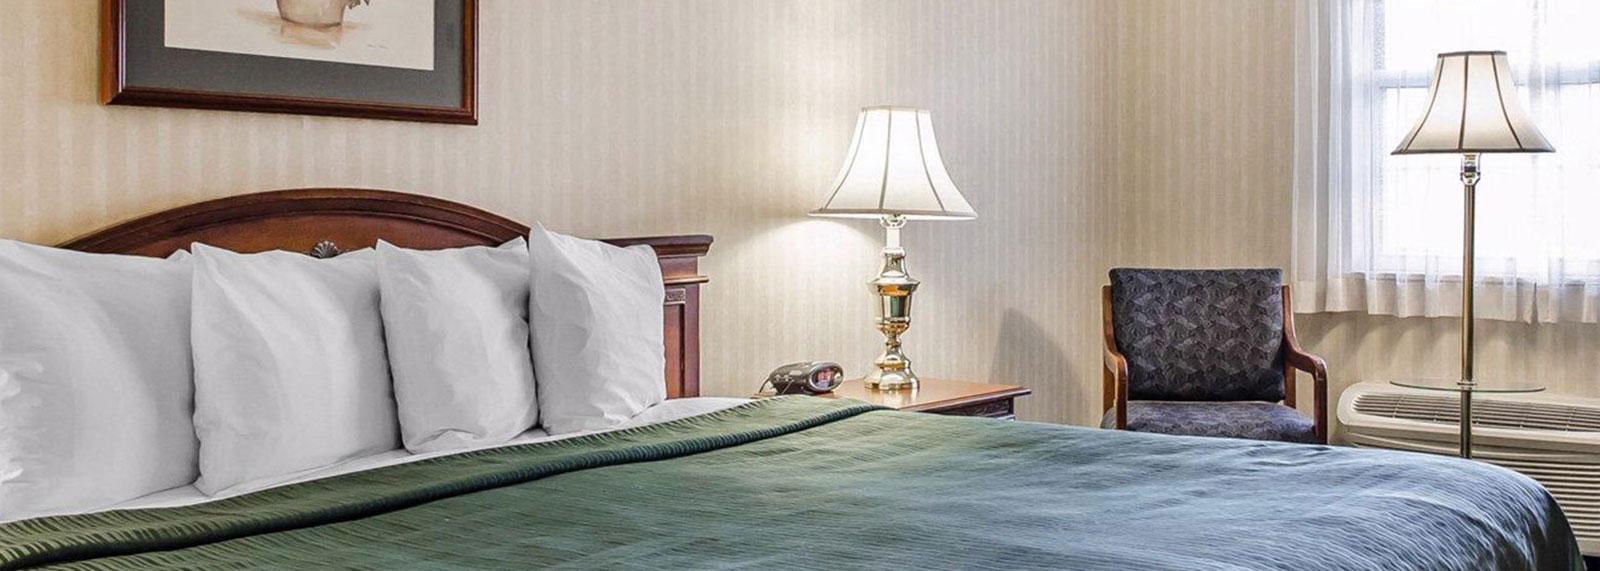 Quality Inn Gettysburg Battlefield Rooms